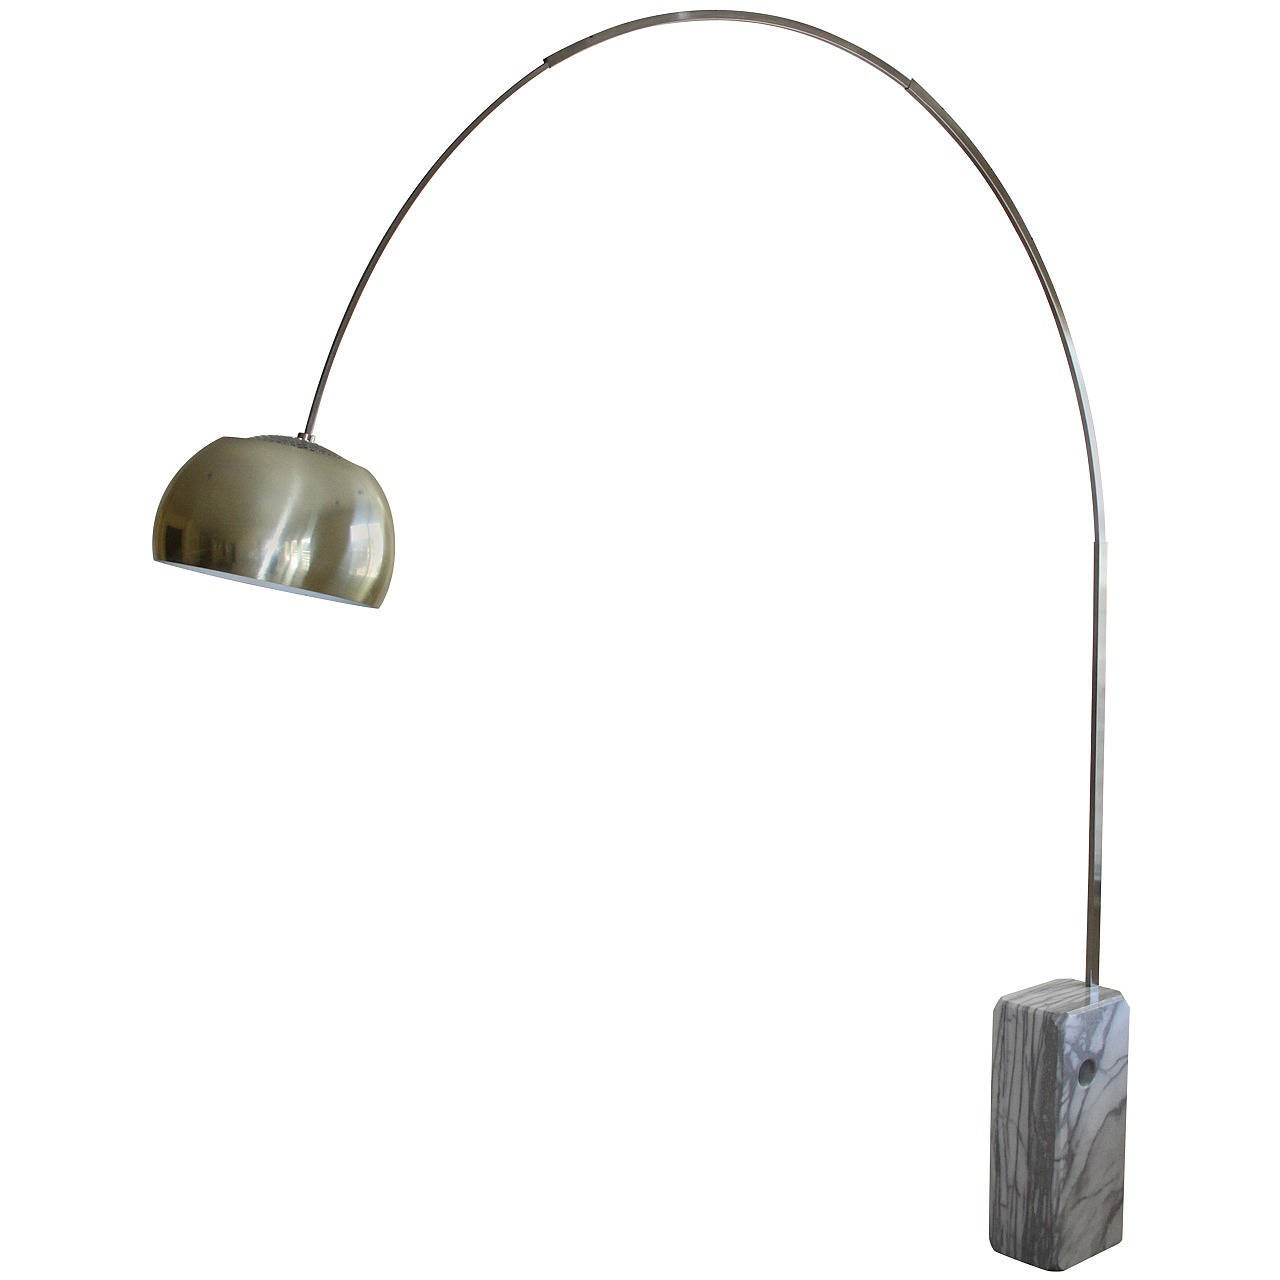 Vintage Arco Floor Lamp Designed By Achille Castiglioni In